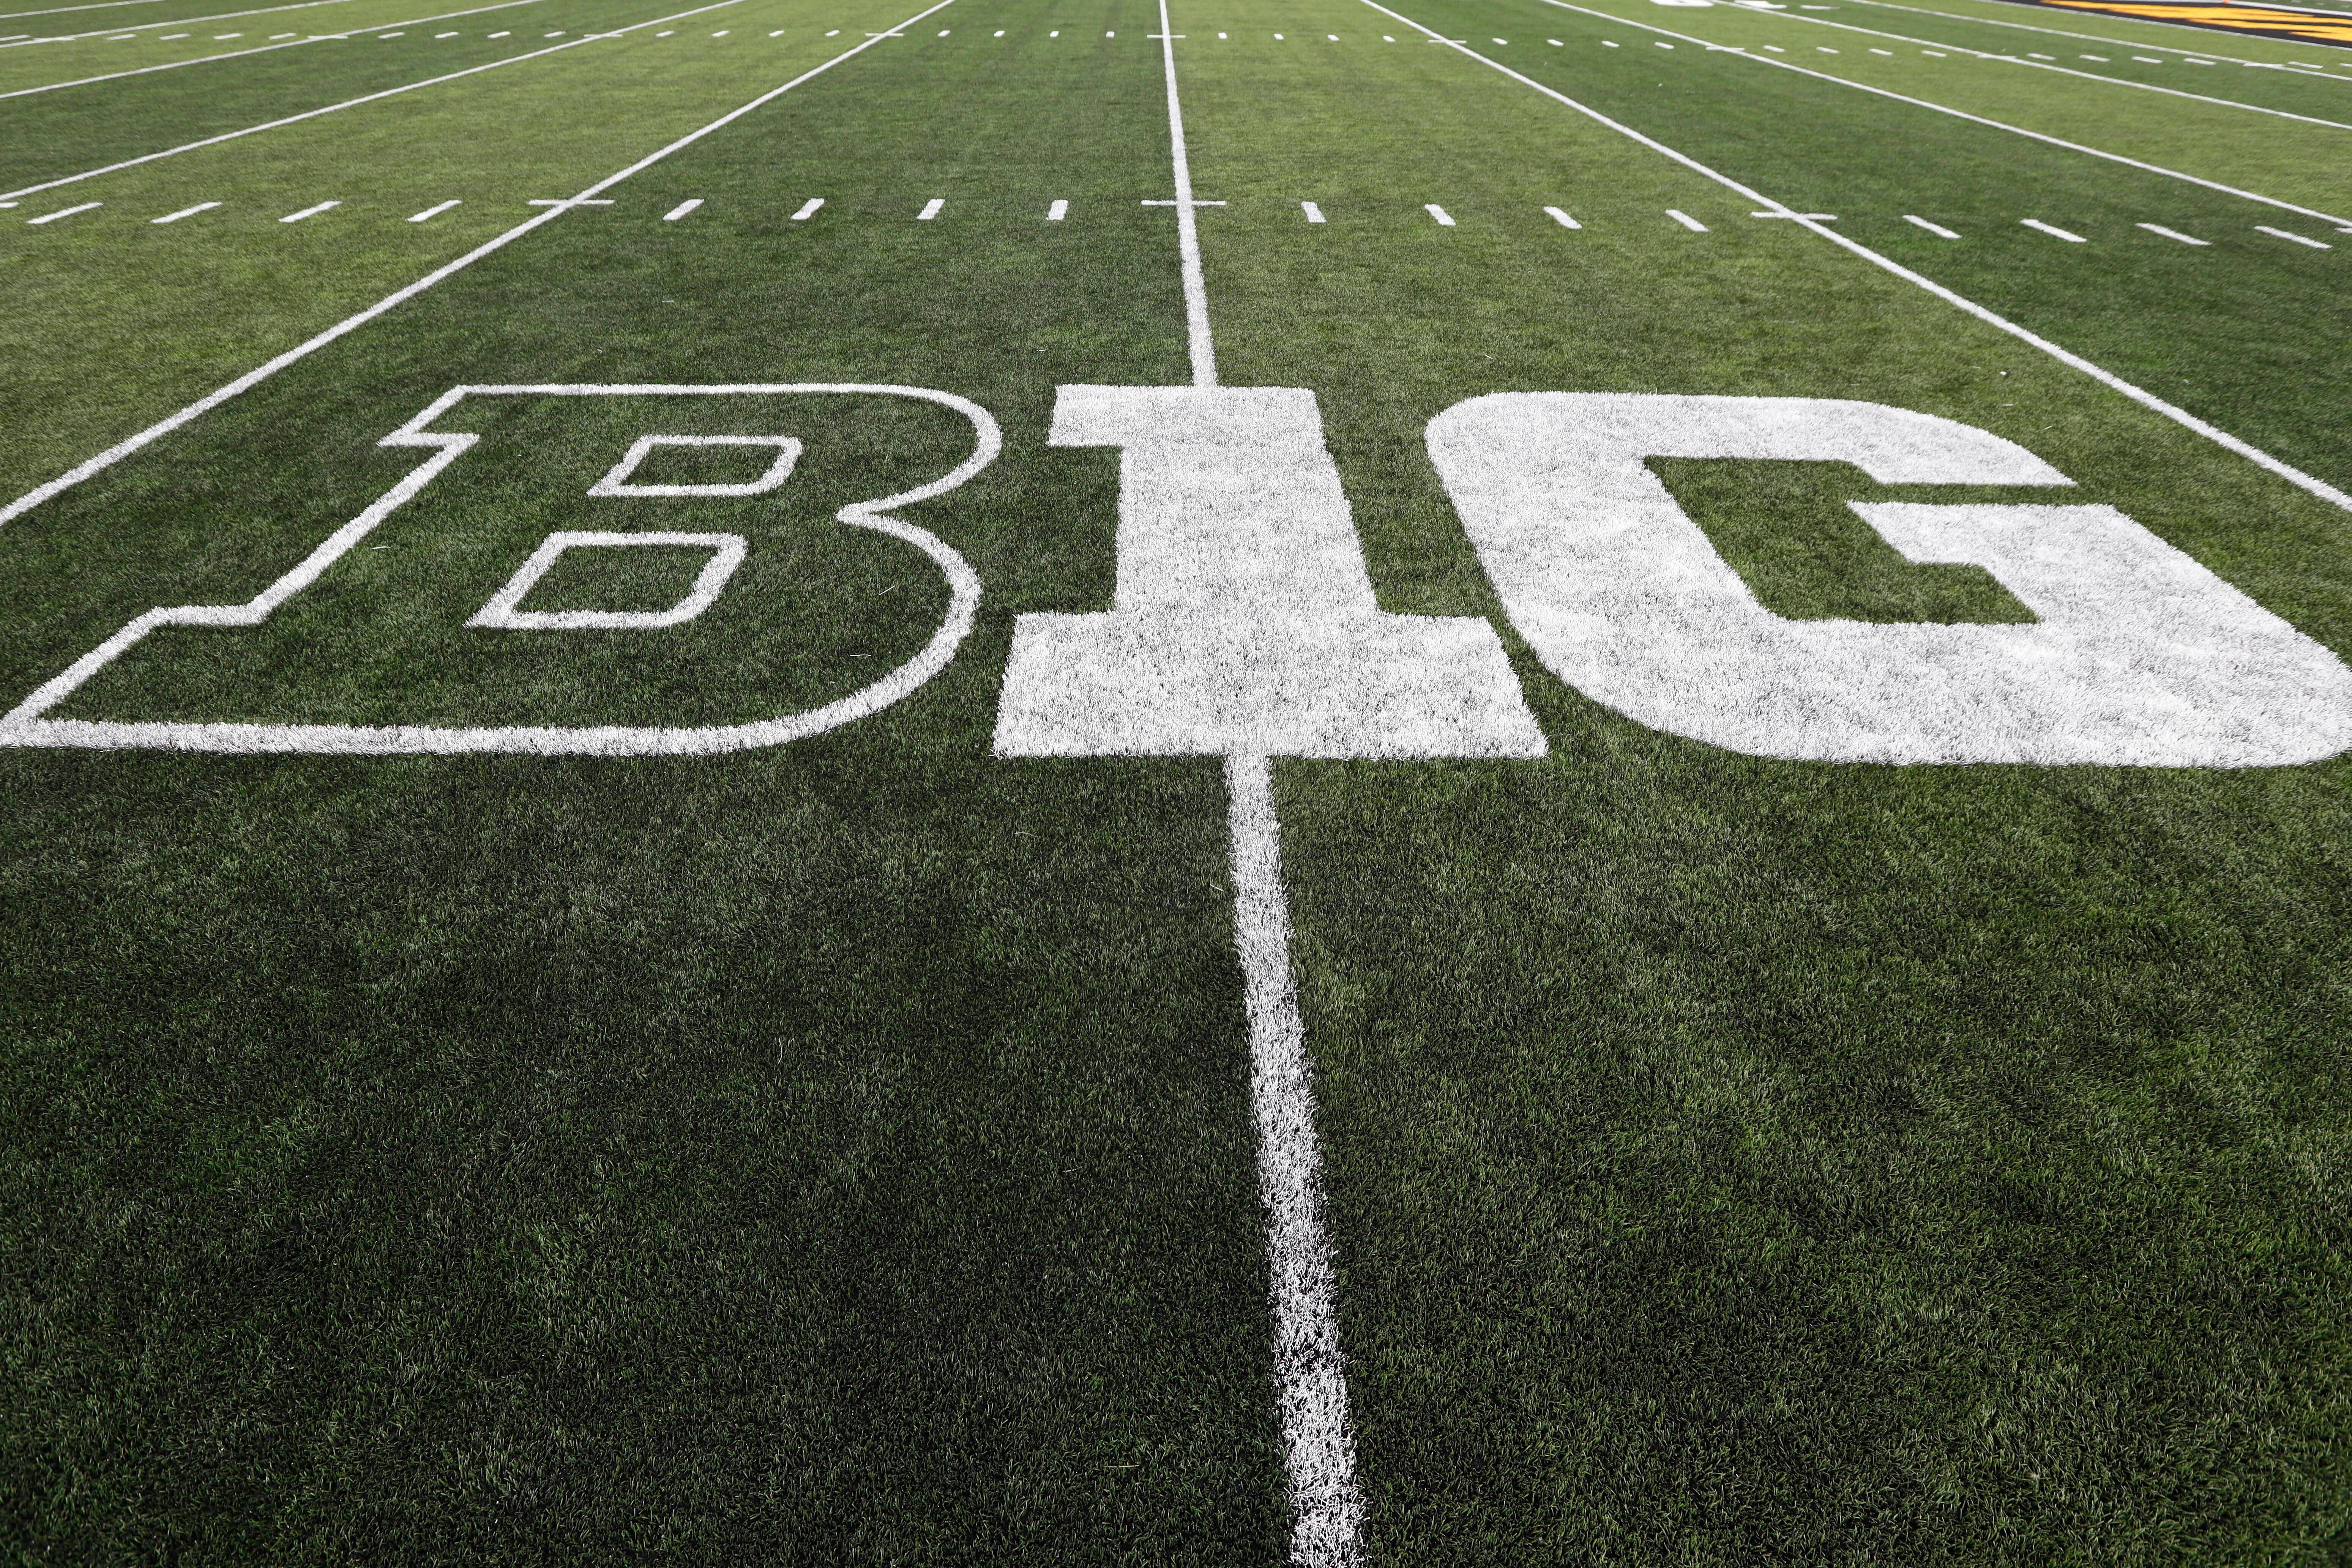 Nebraska president: Big Ten will announce plan for 2020 football season Tuesday